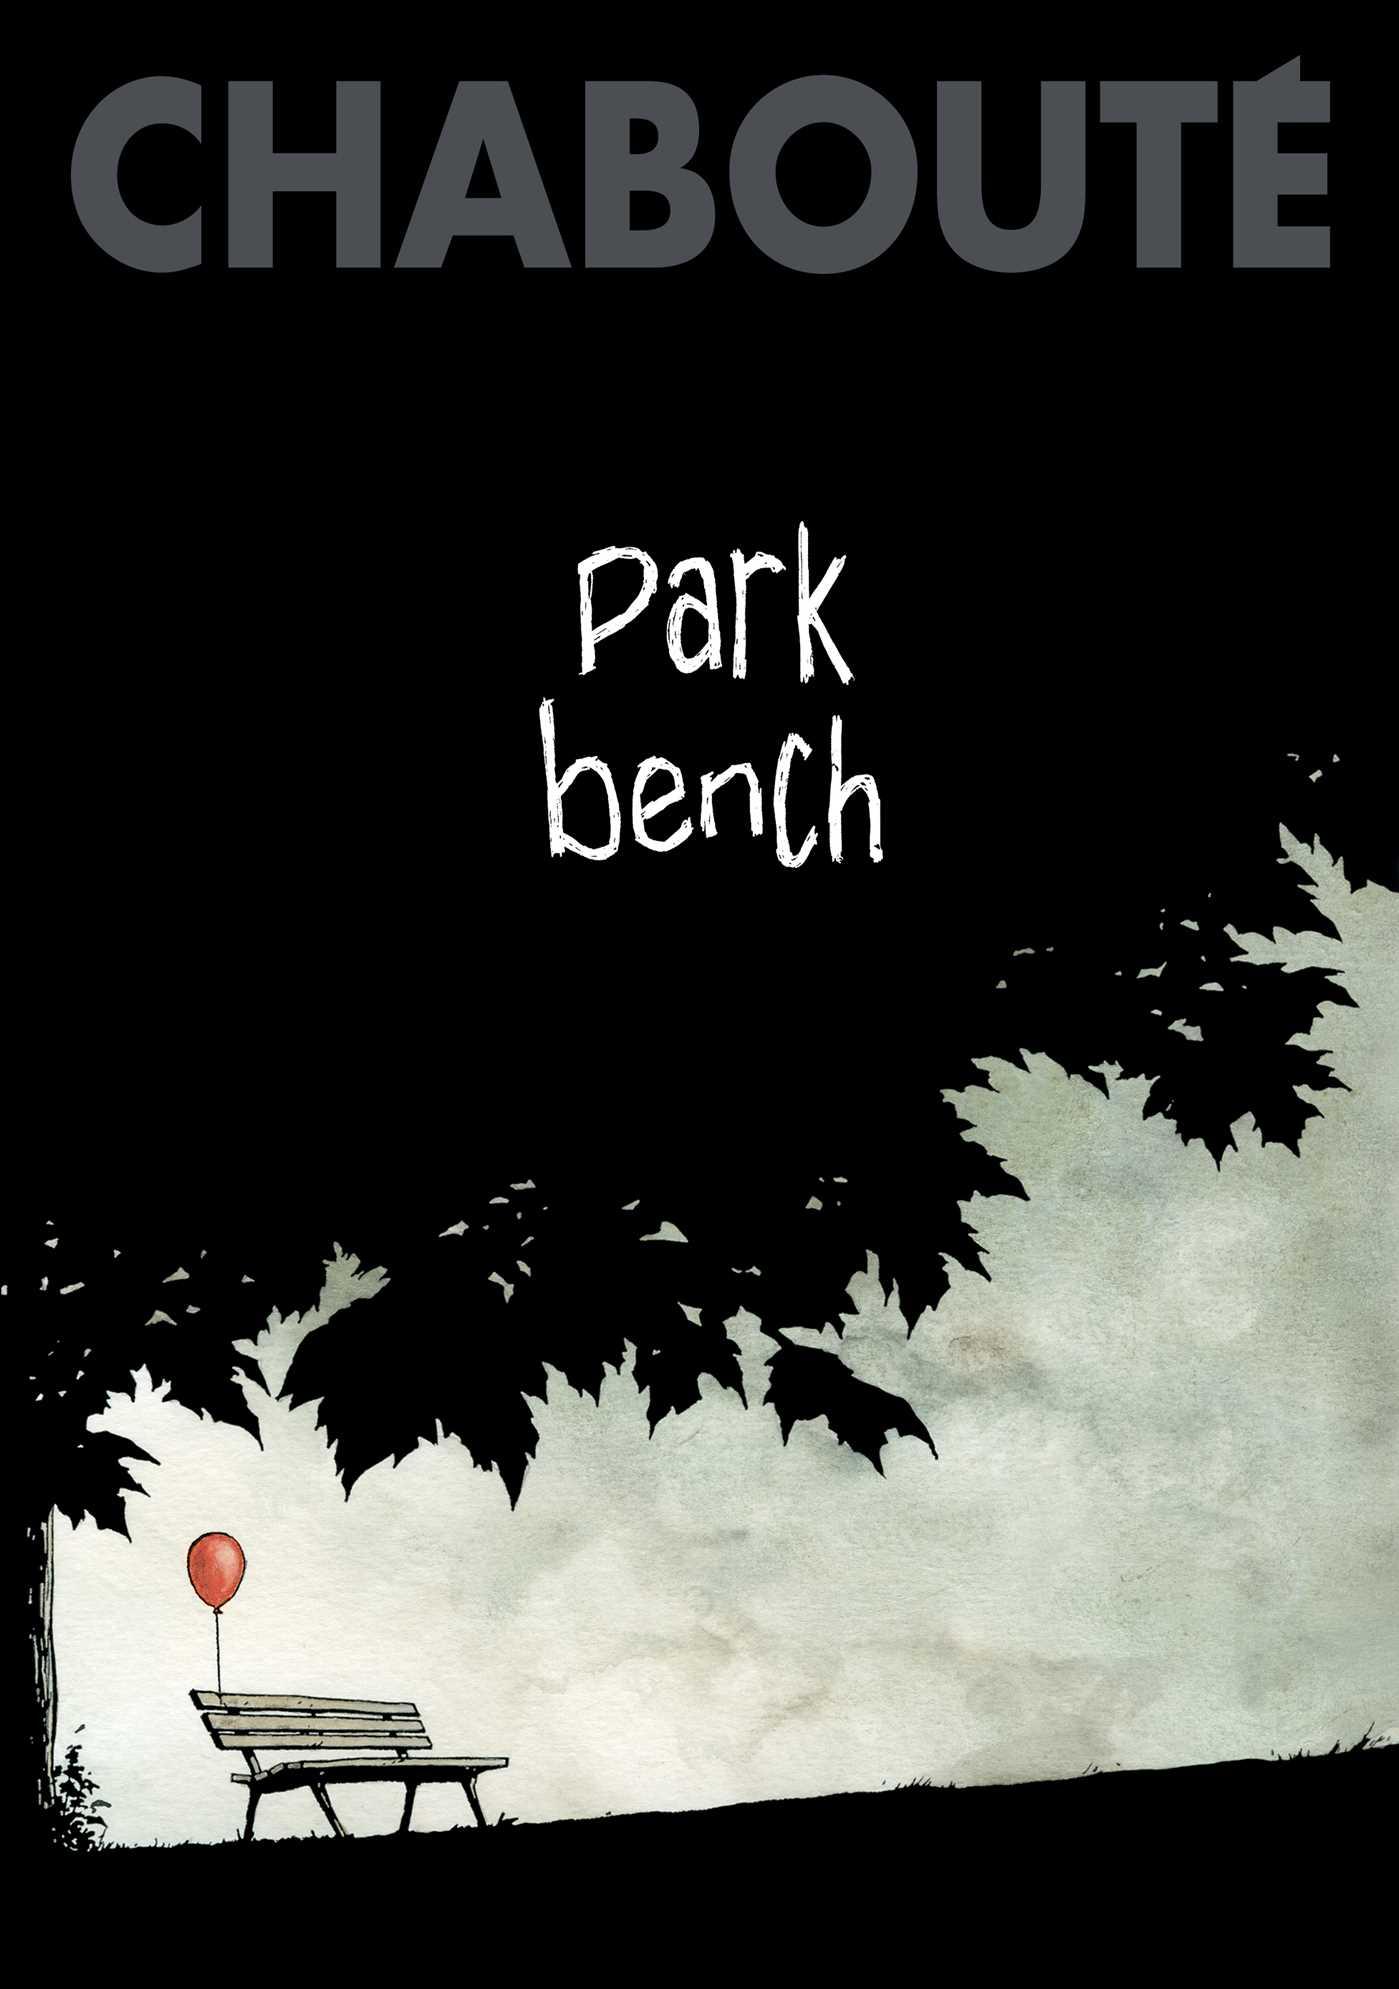 Park bench 9781501154034 hr